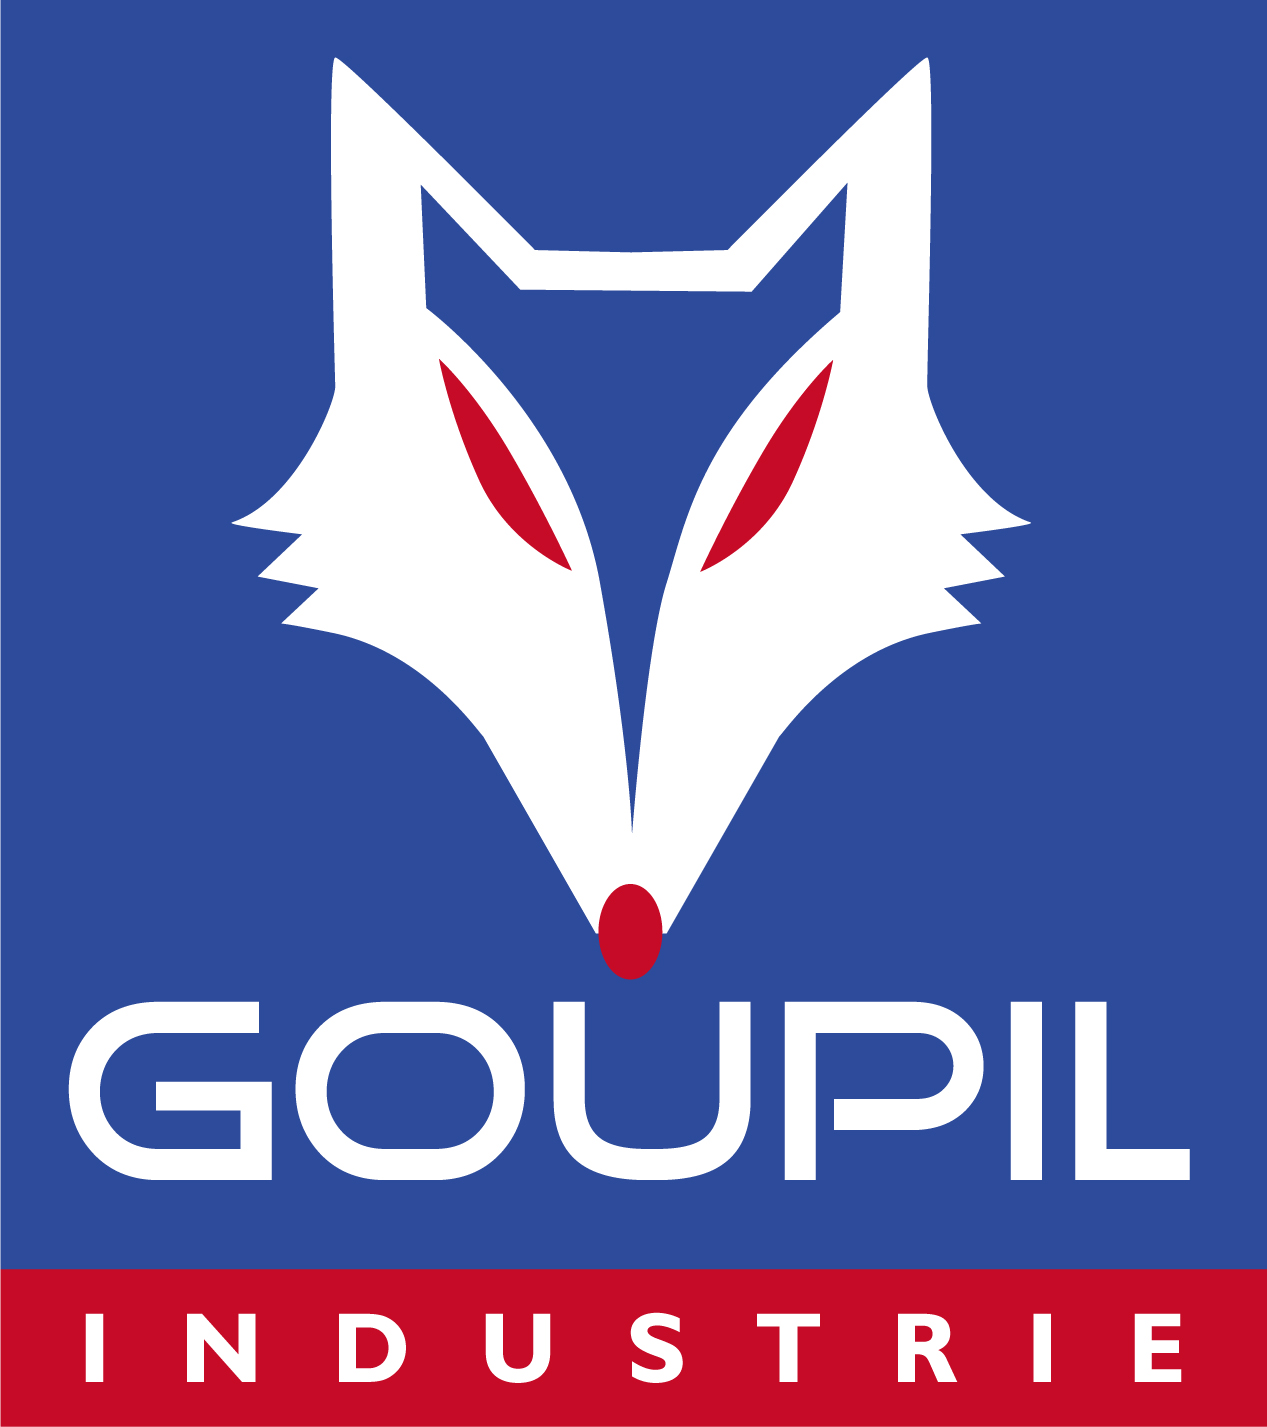 Logo GOUPIL ok.jpg